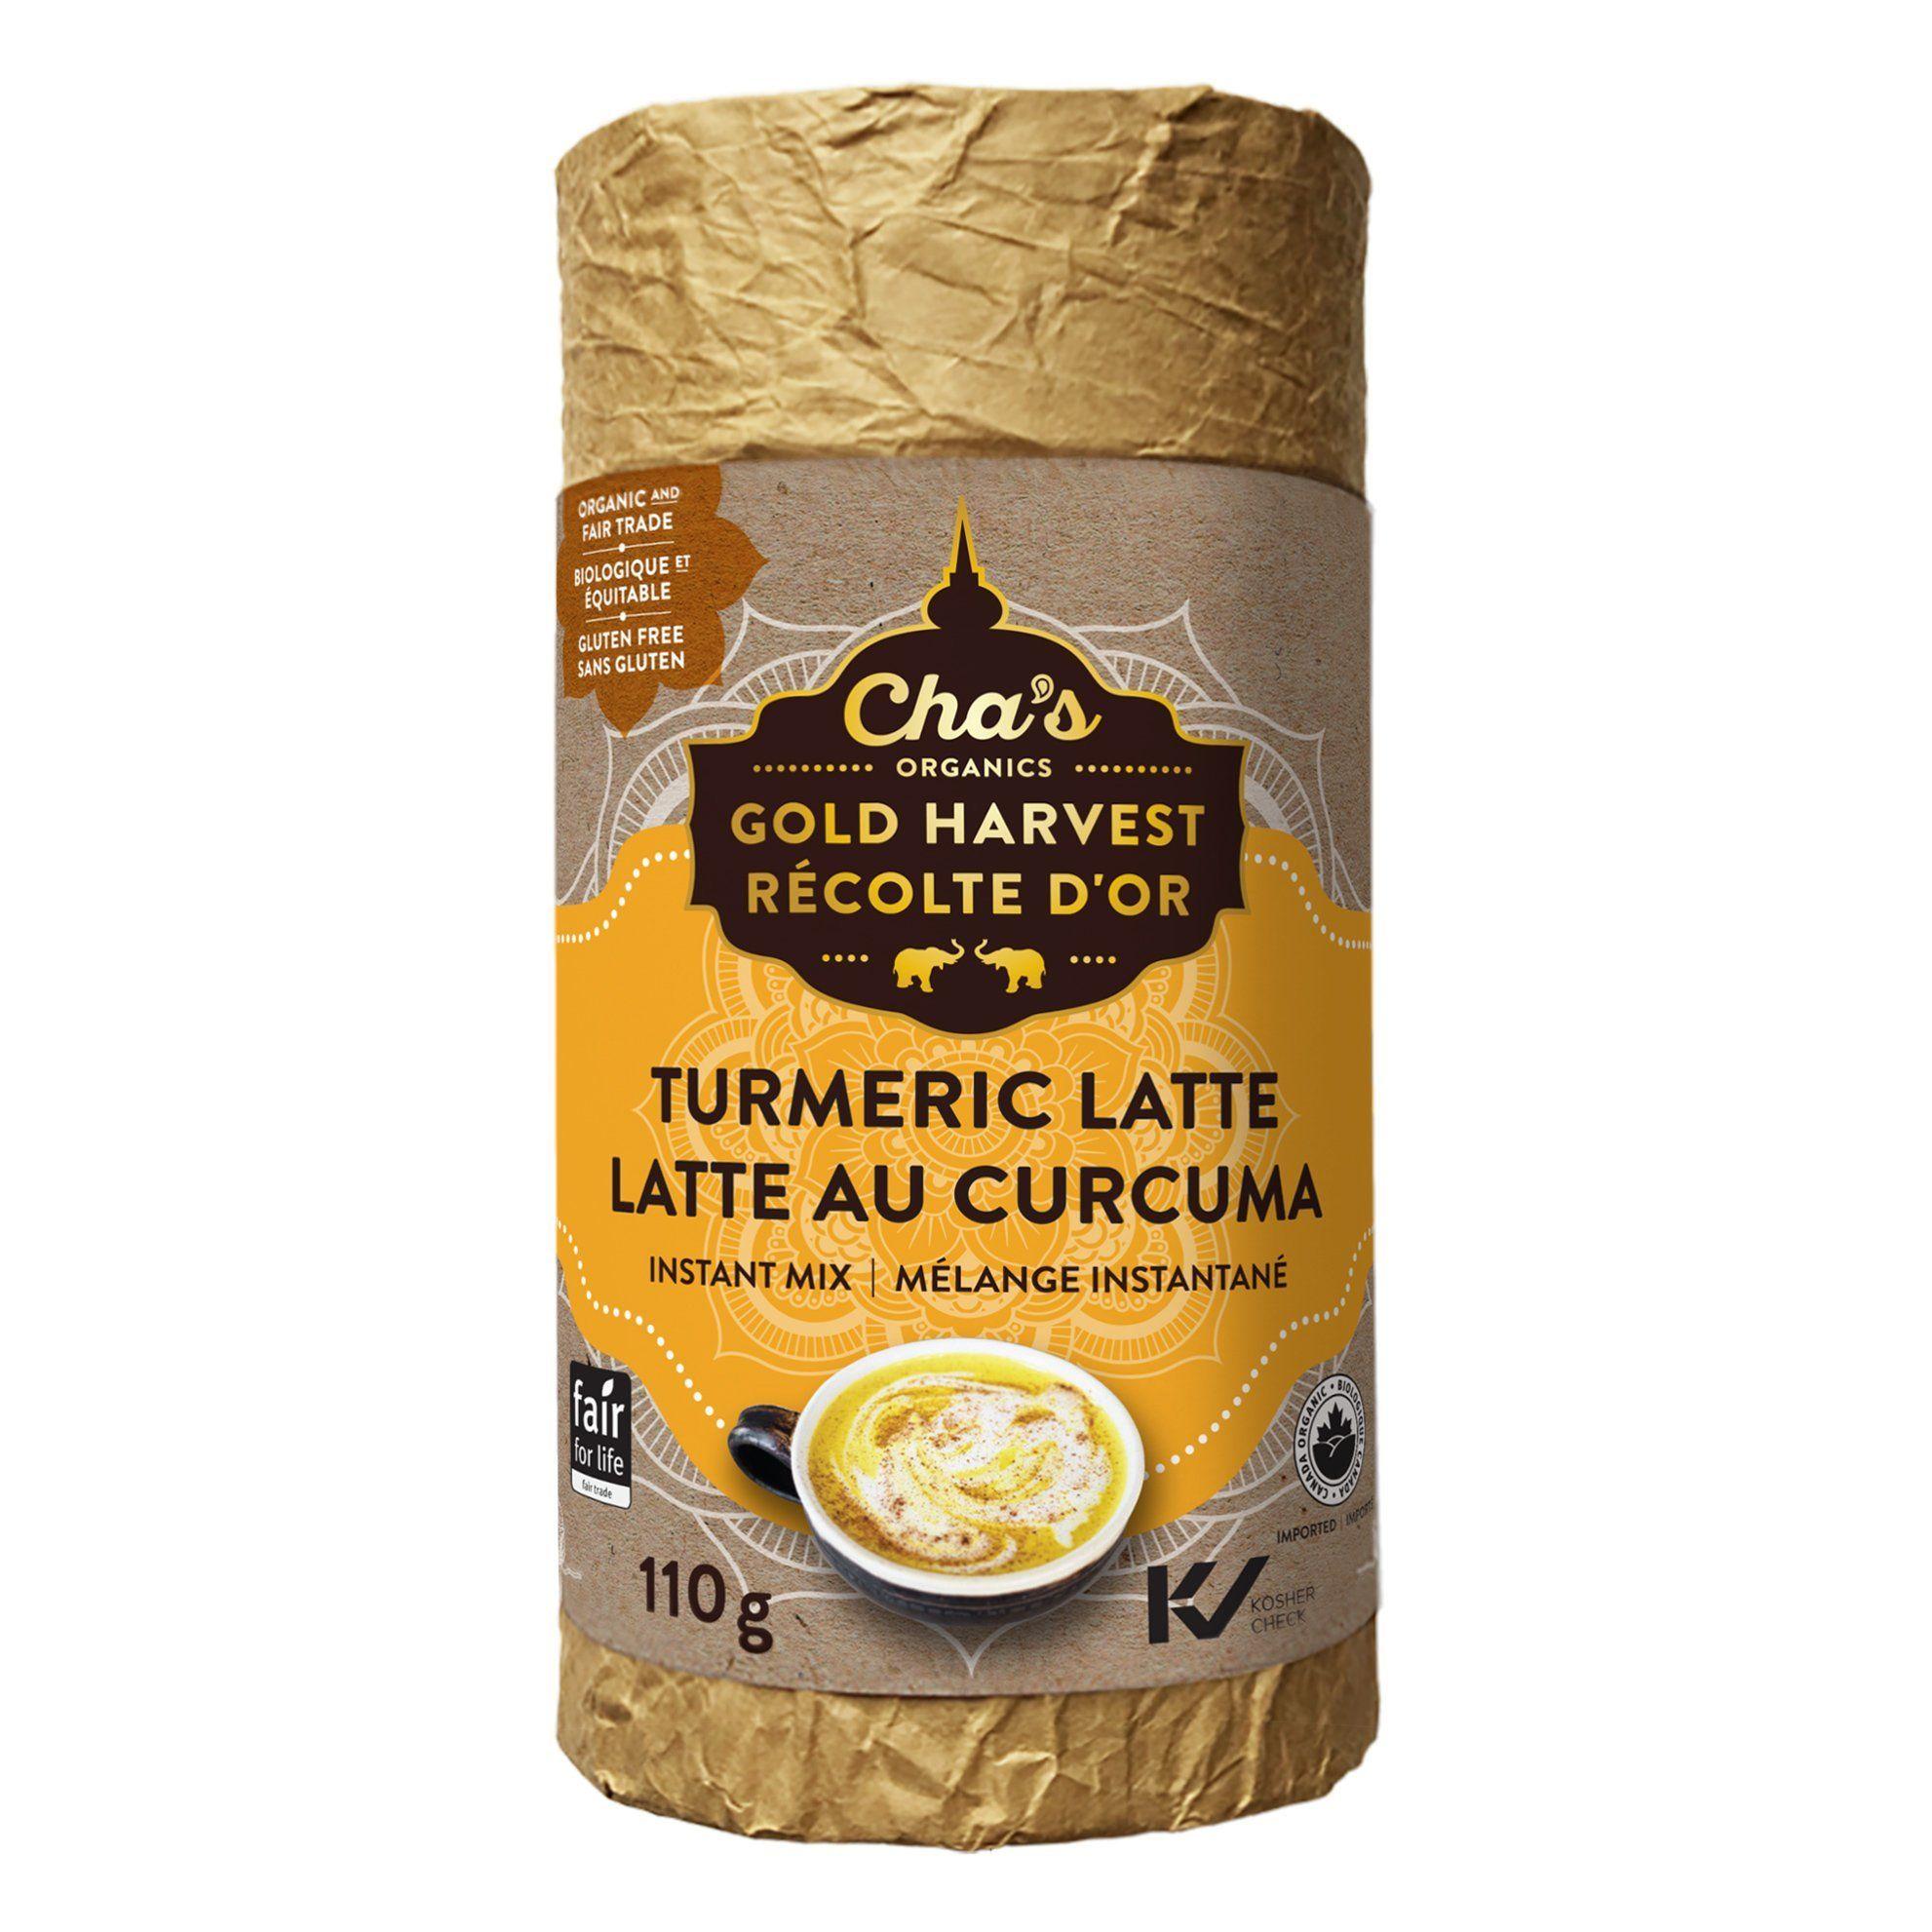 Cha's Organics - Tumeric Latte Mix, 110g